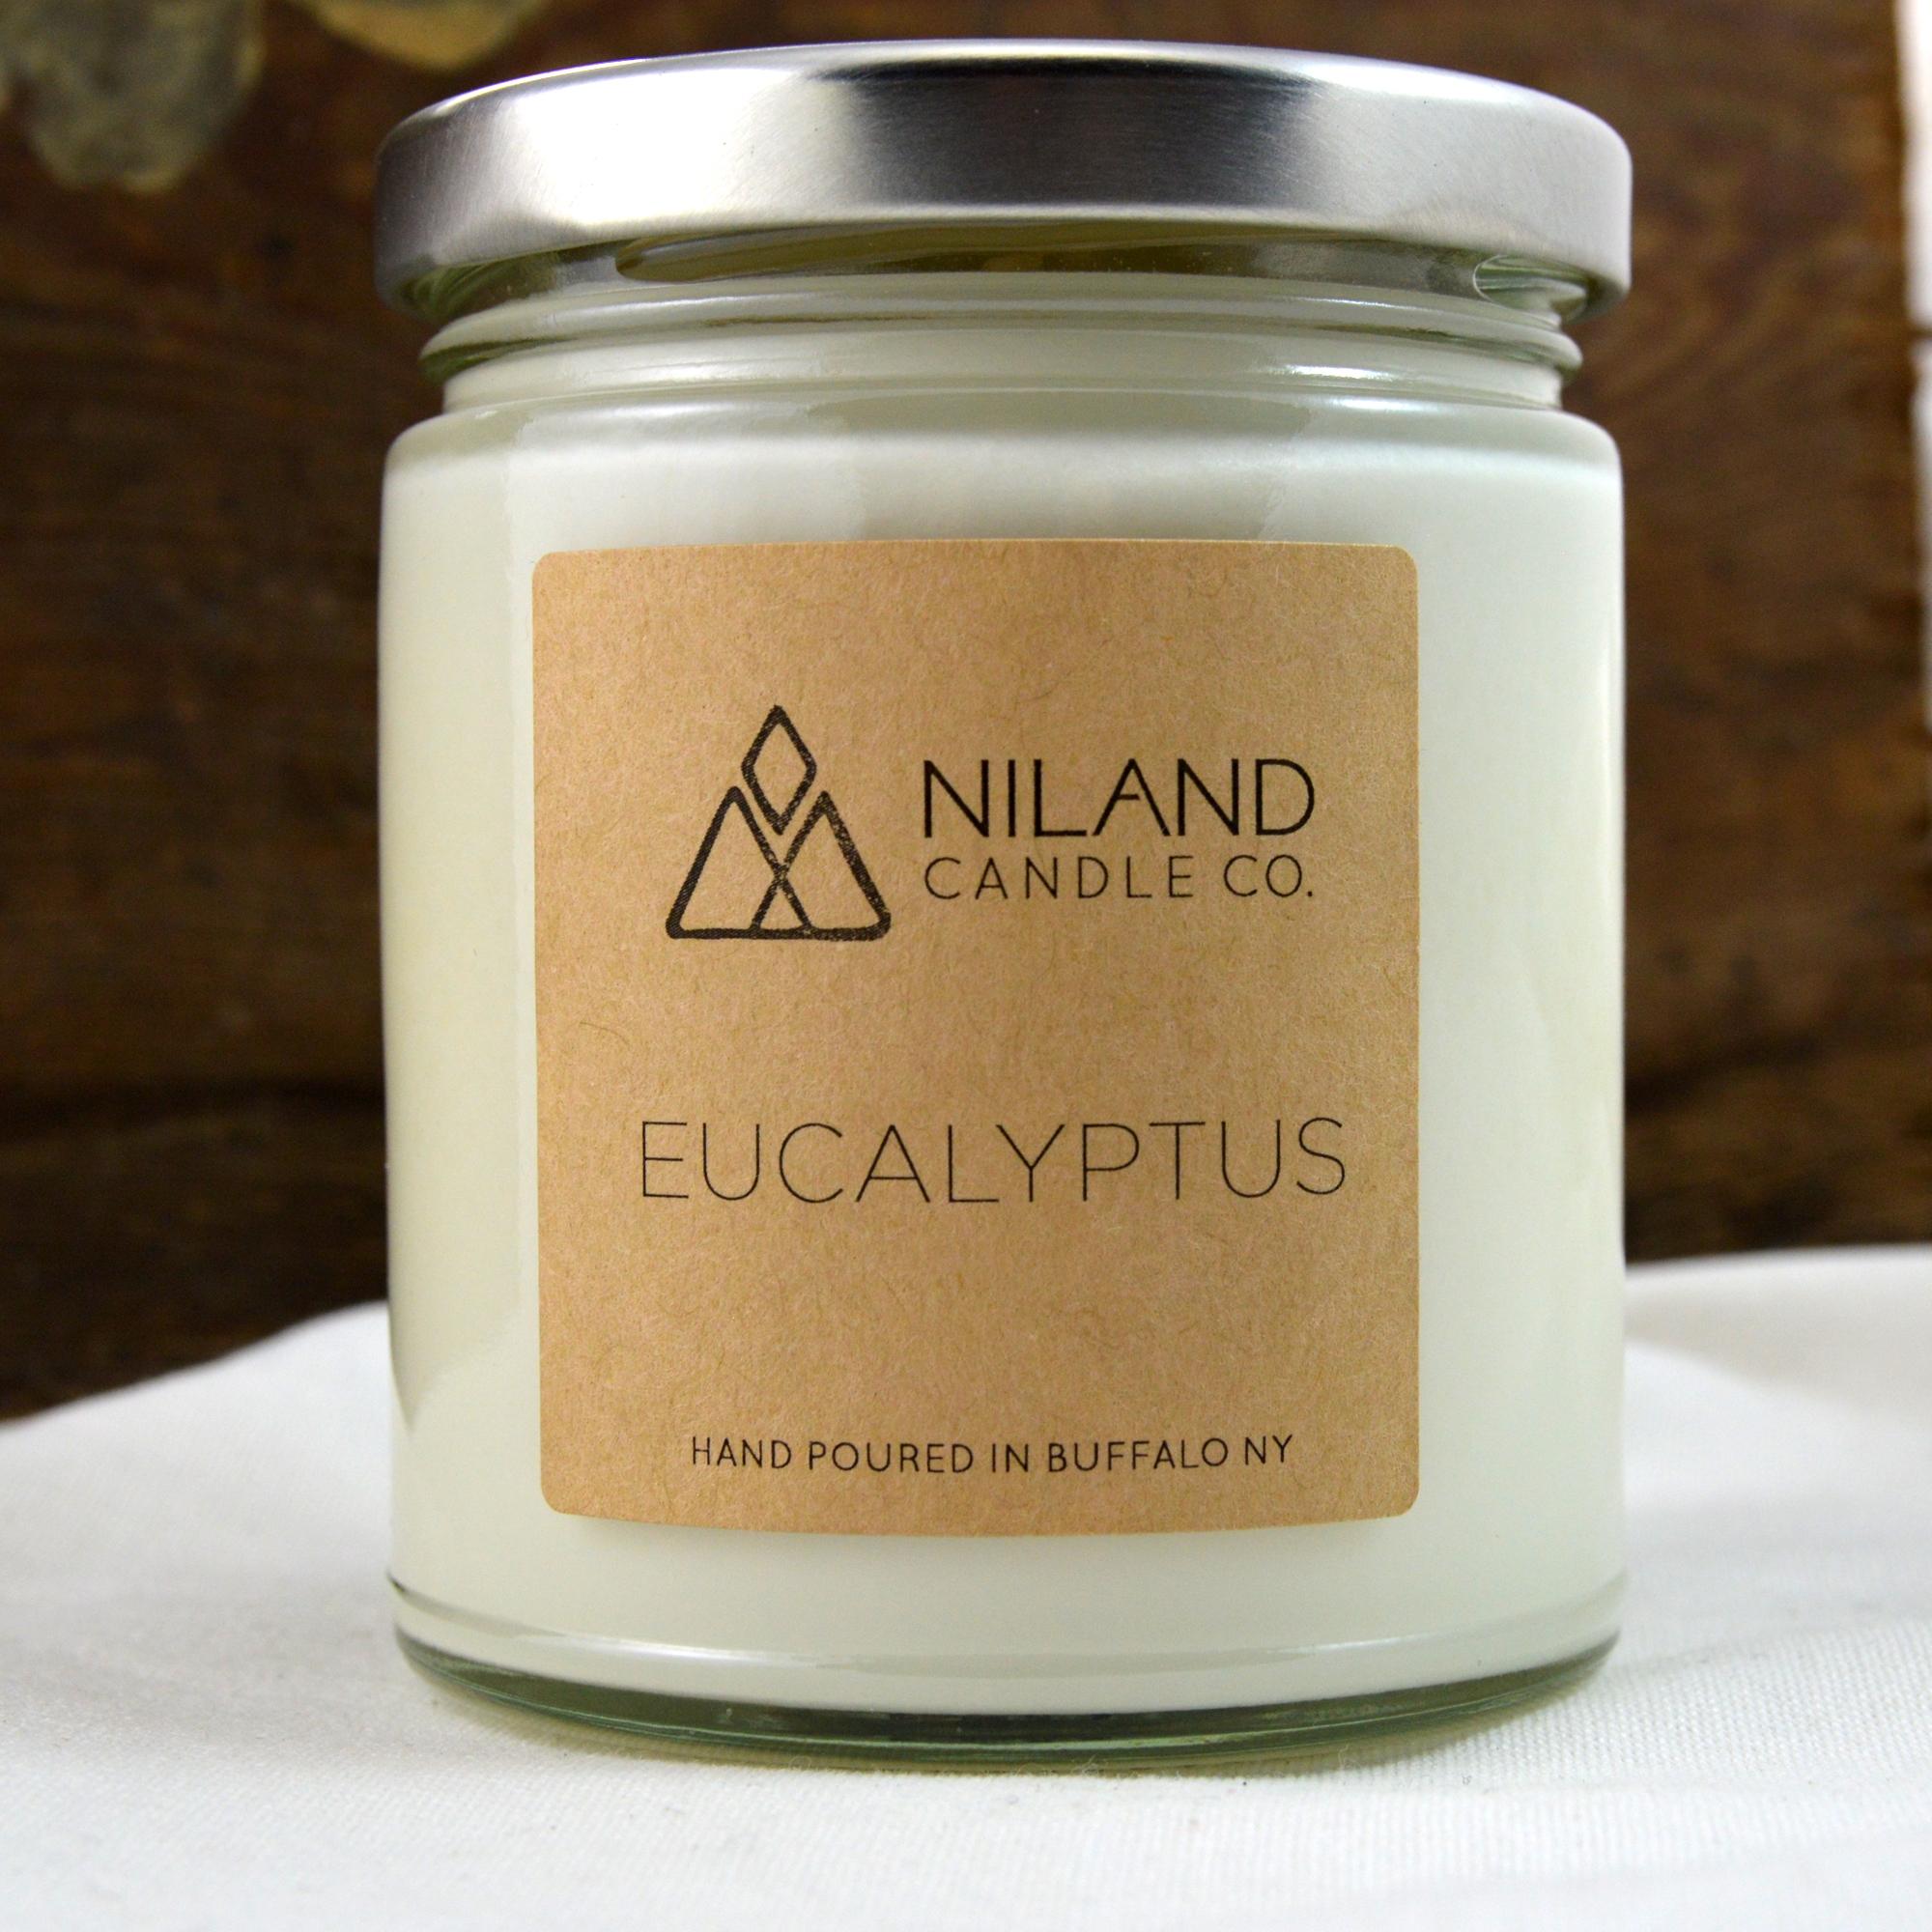 eucalyptus soy candle made in buffalo ny gift shop